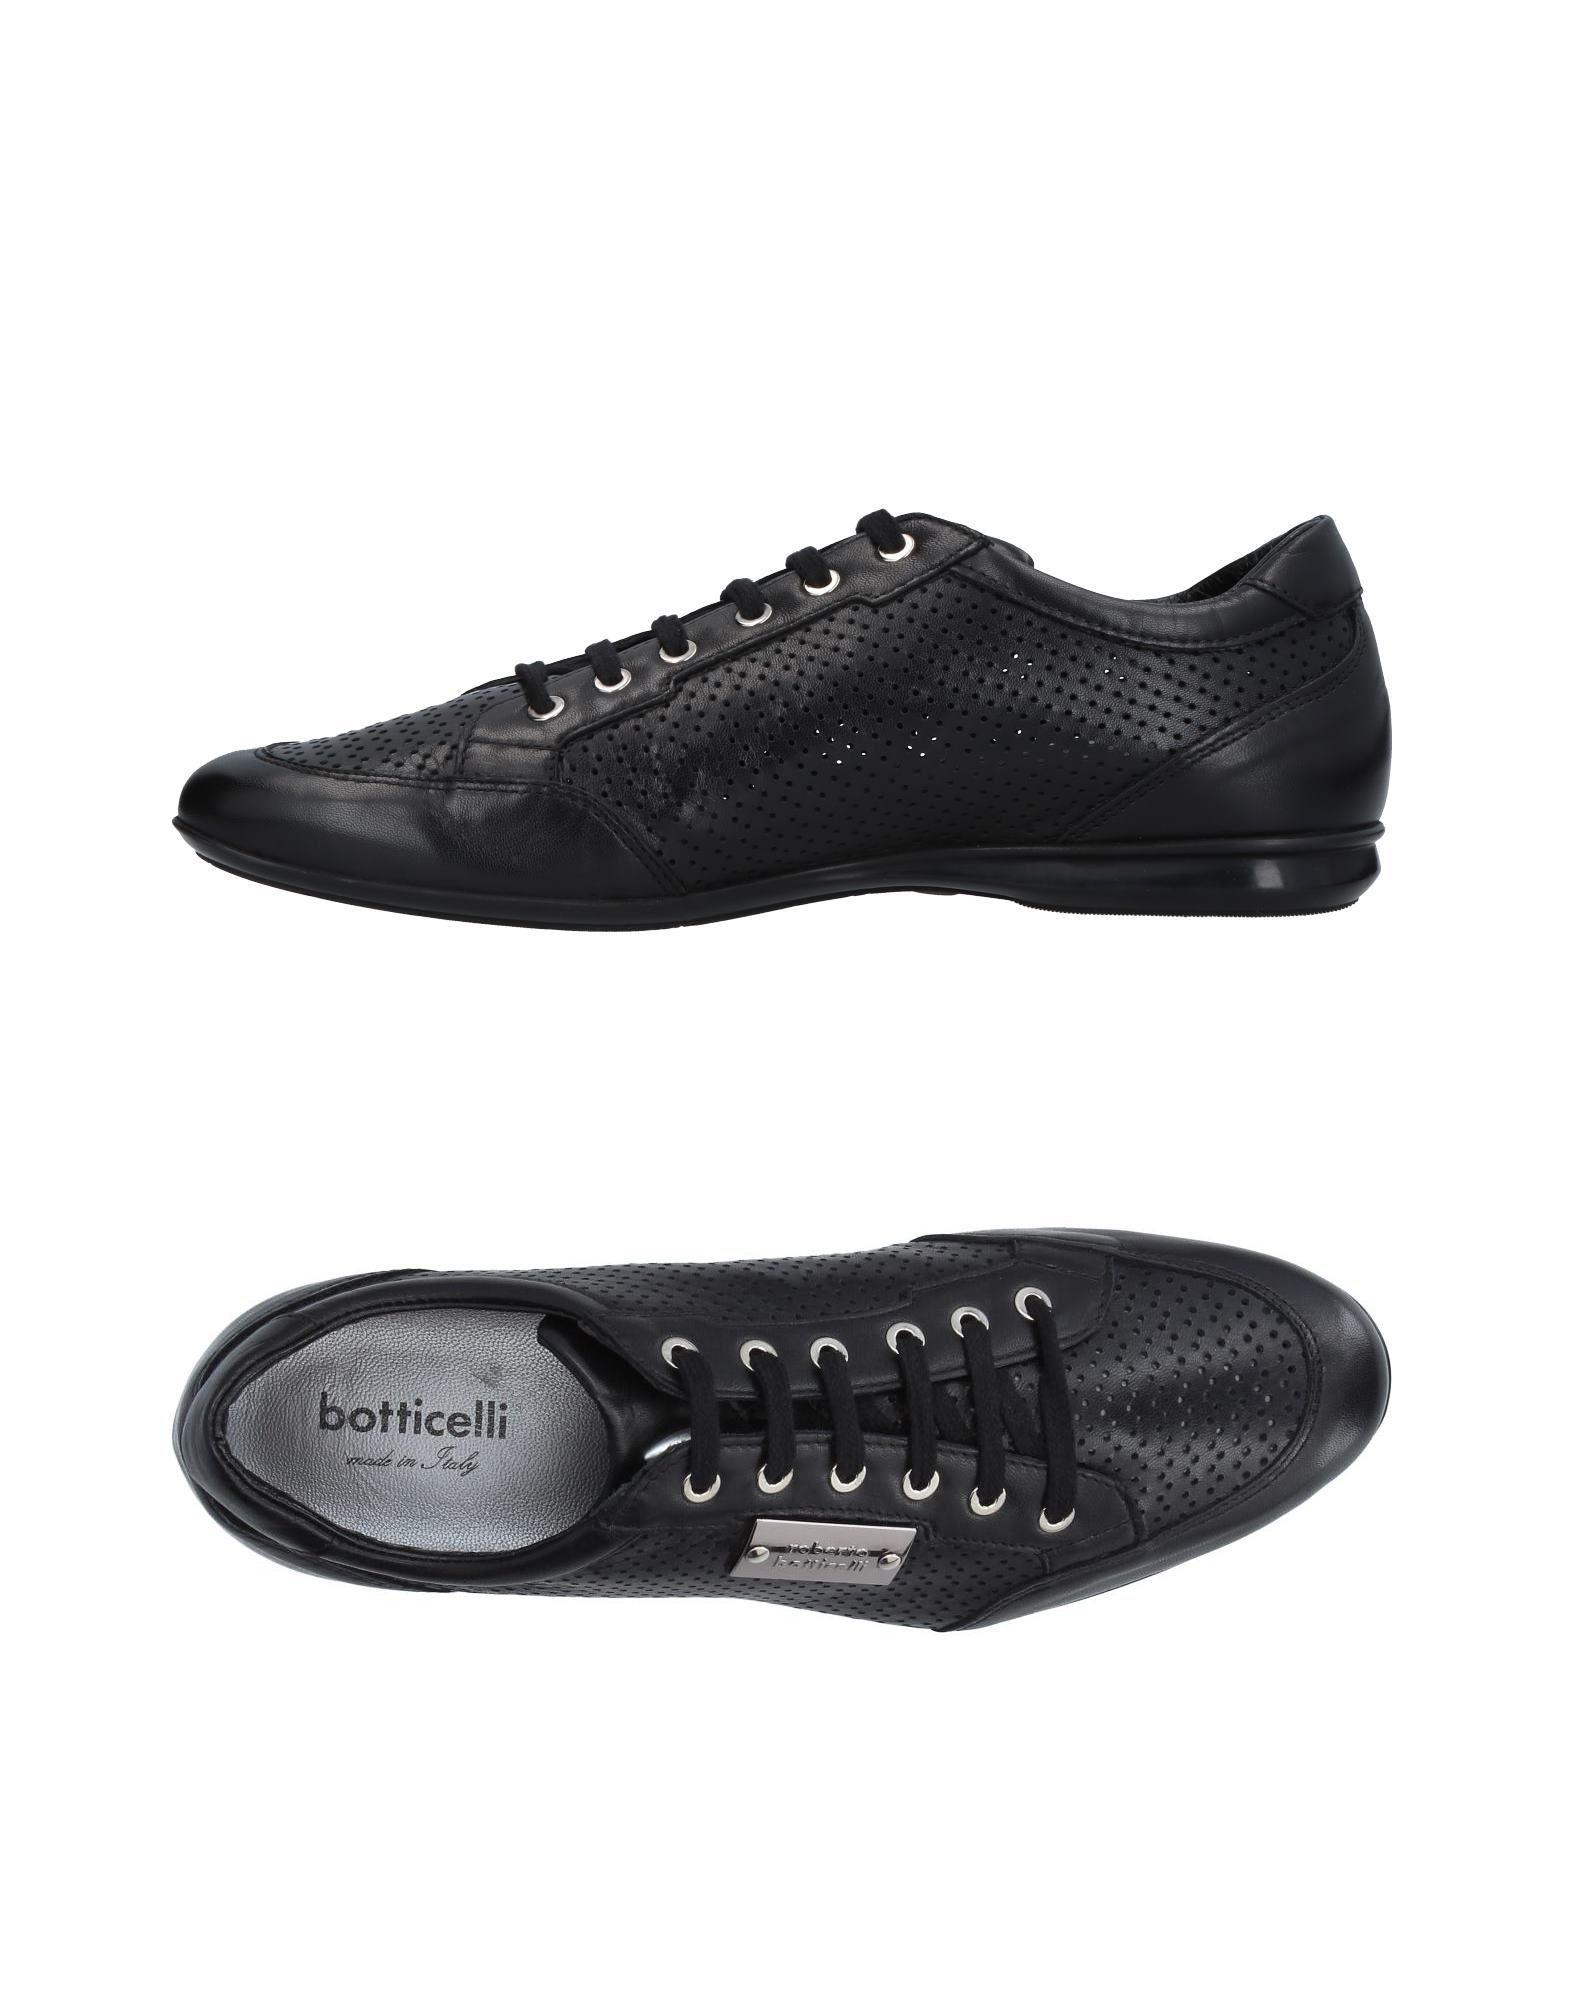 BOTTICELLI Sneakers Homme WHITE, 43